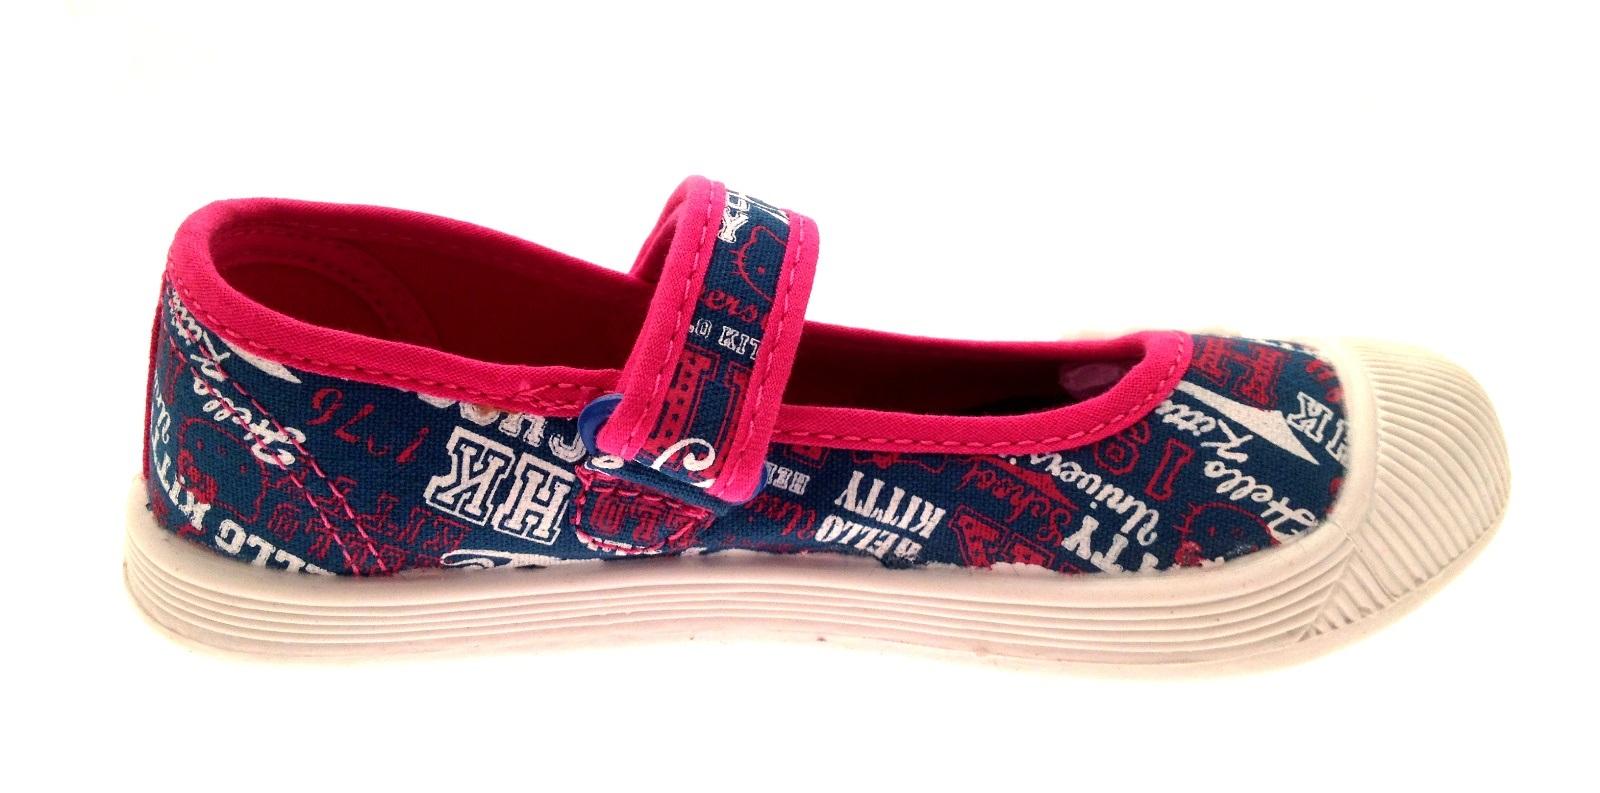 Niños Niñas Hello Kitty De Lona Bombas Mary Jane Velcro Verano Zapatos Talla Uk 8 a 2